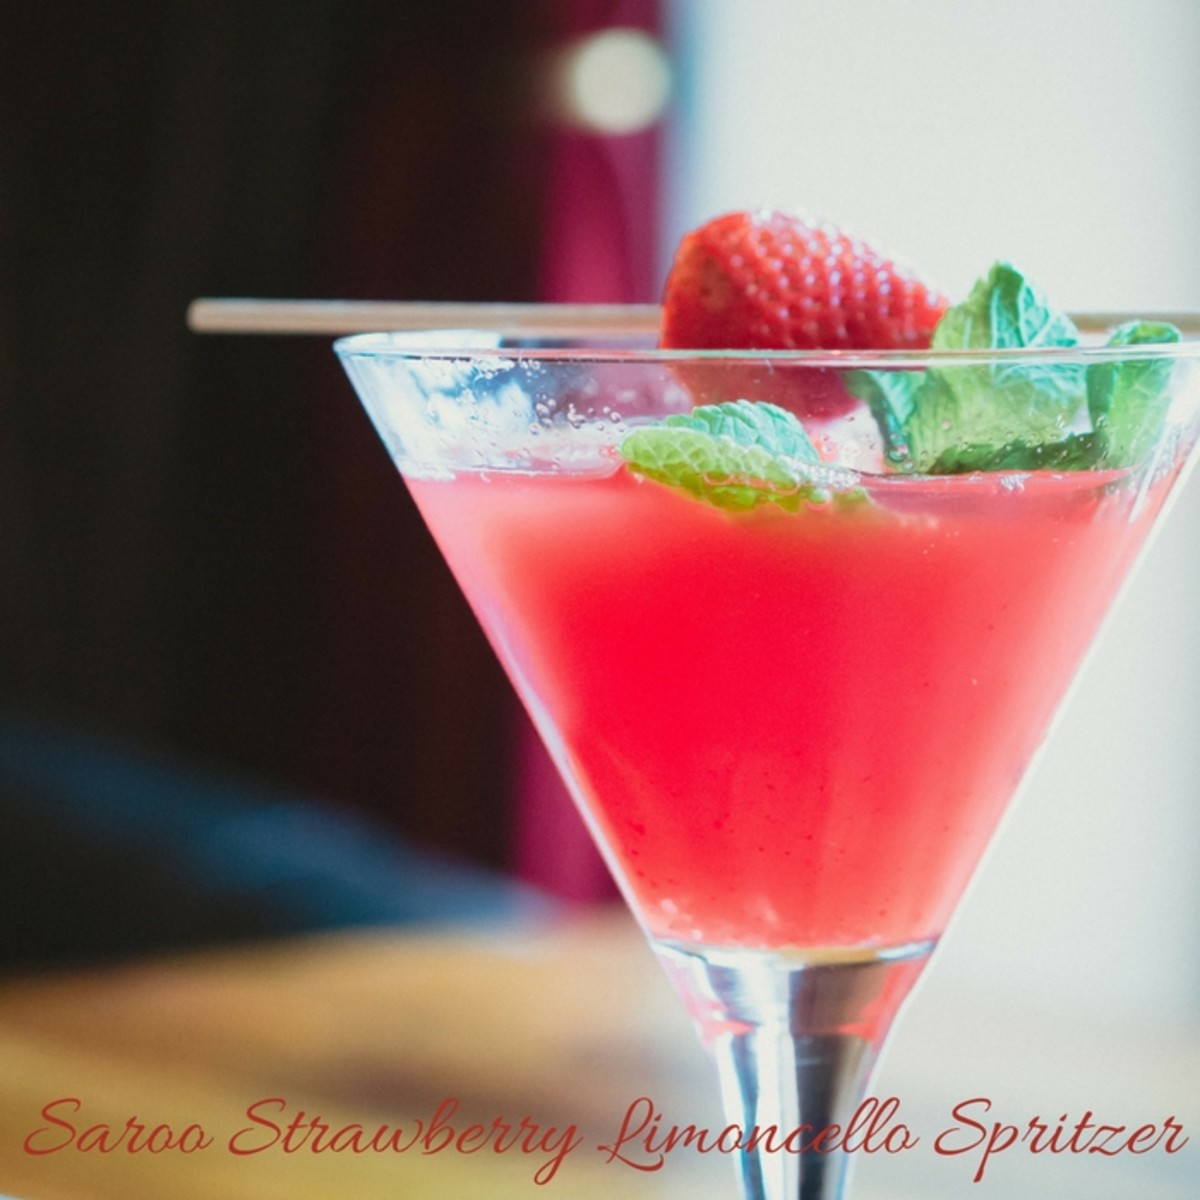 Strawberry Limoncello Spritzer